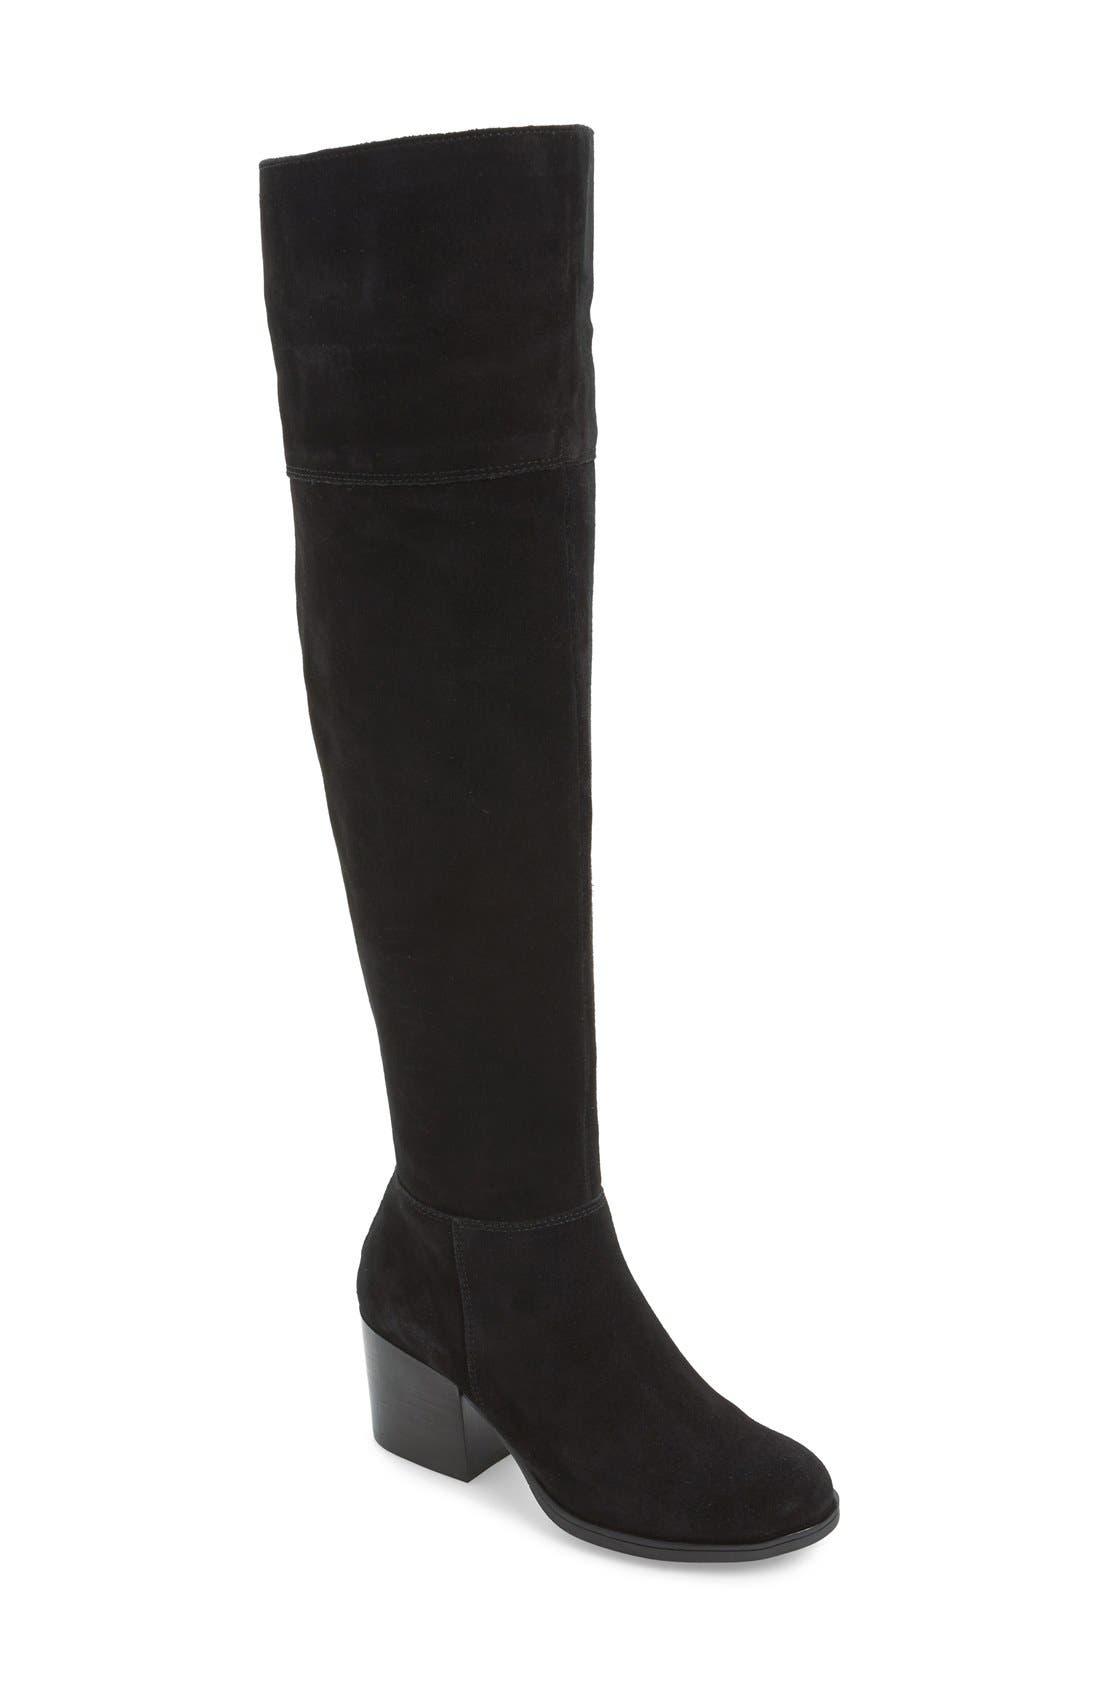 'Orabela' Knee High Boot,                             Main thumbnail 1, color,                             006